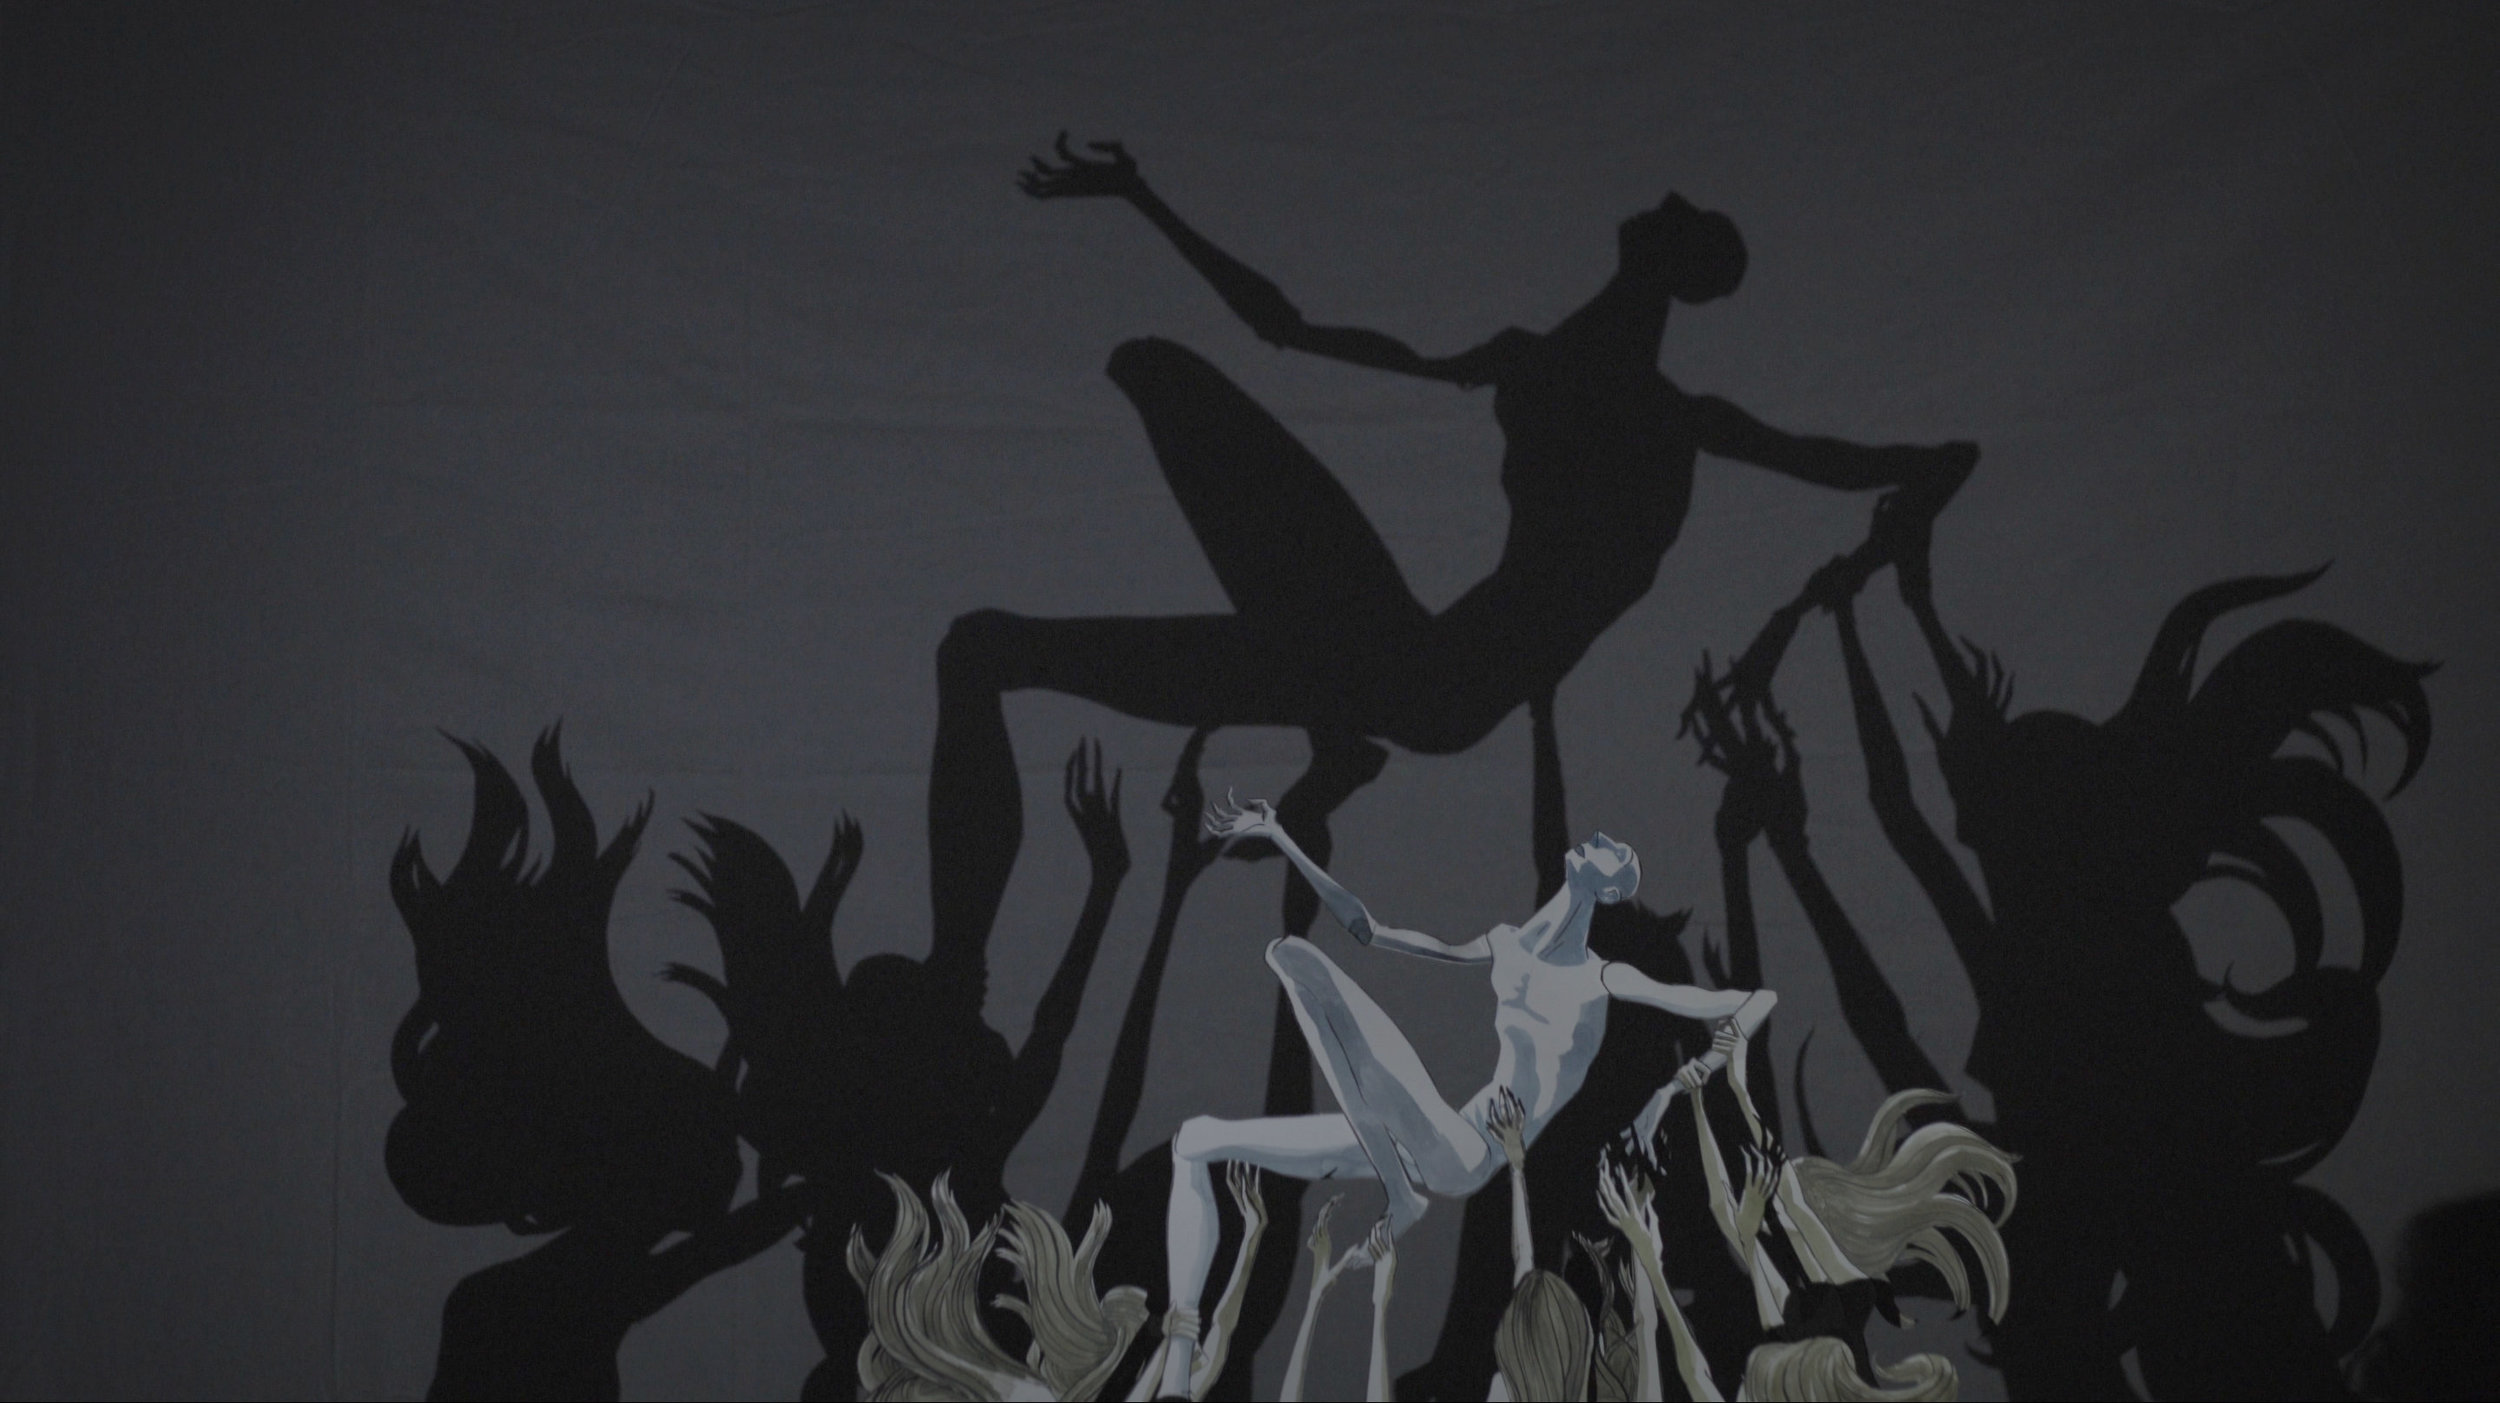 Lyon Hill's piece Siren Song